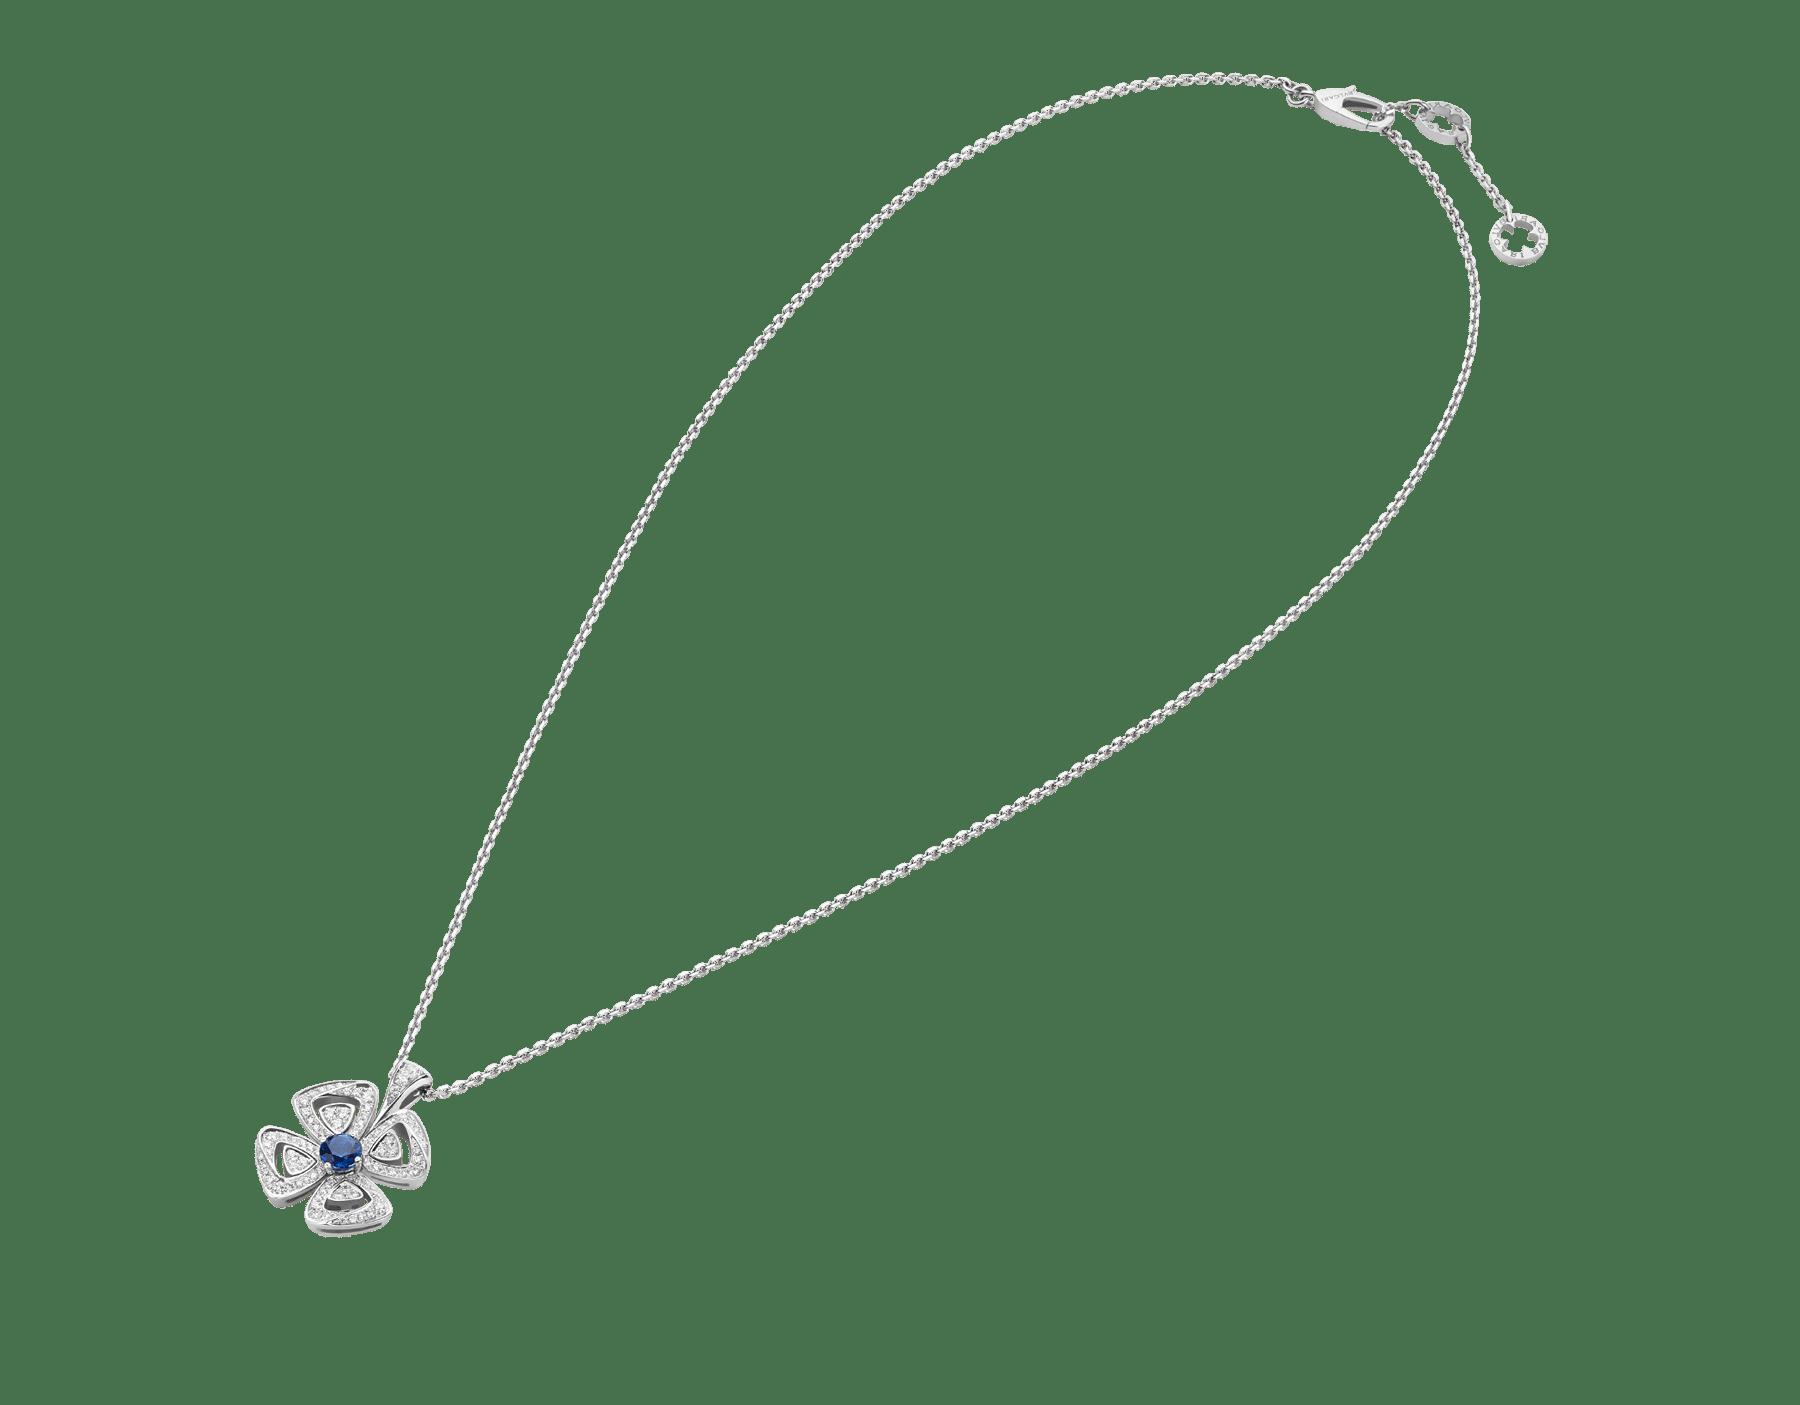 Fiorever 18K 白金項鍊,鑲飾 1 顆明亮型切割藍寶石(0.43 克拉)和密鑲鑽石(0.31 克拉)。 358426 image 2